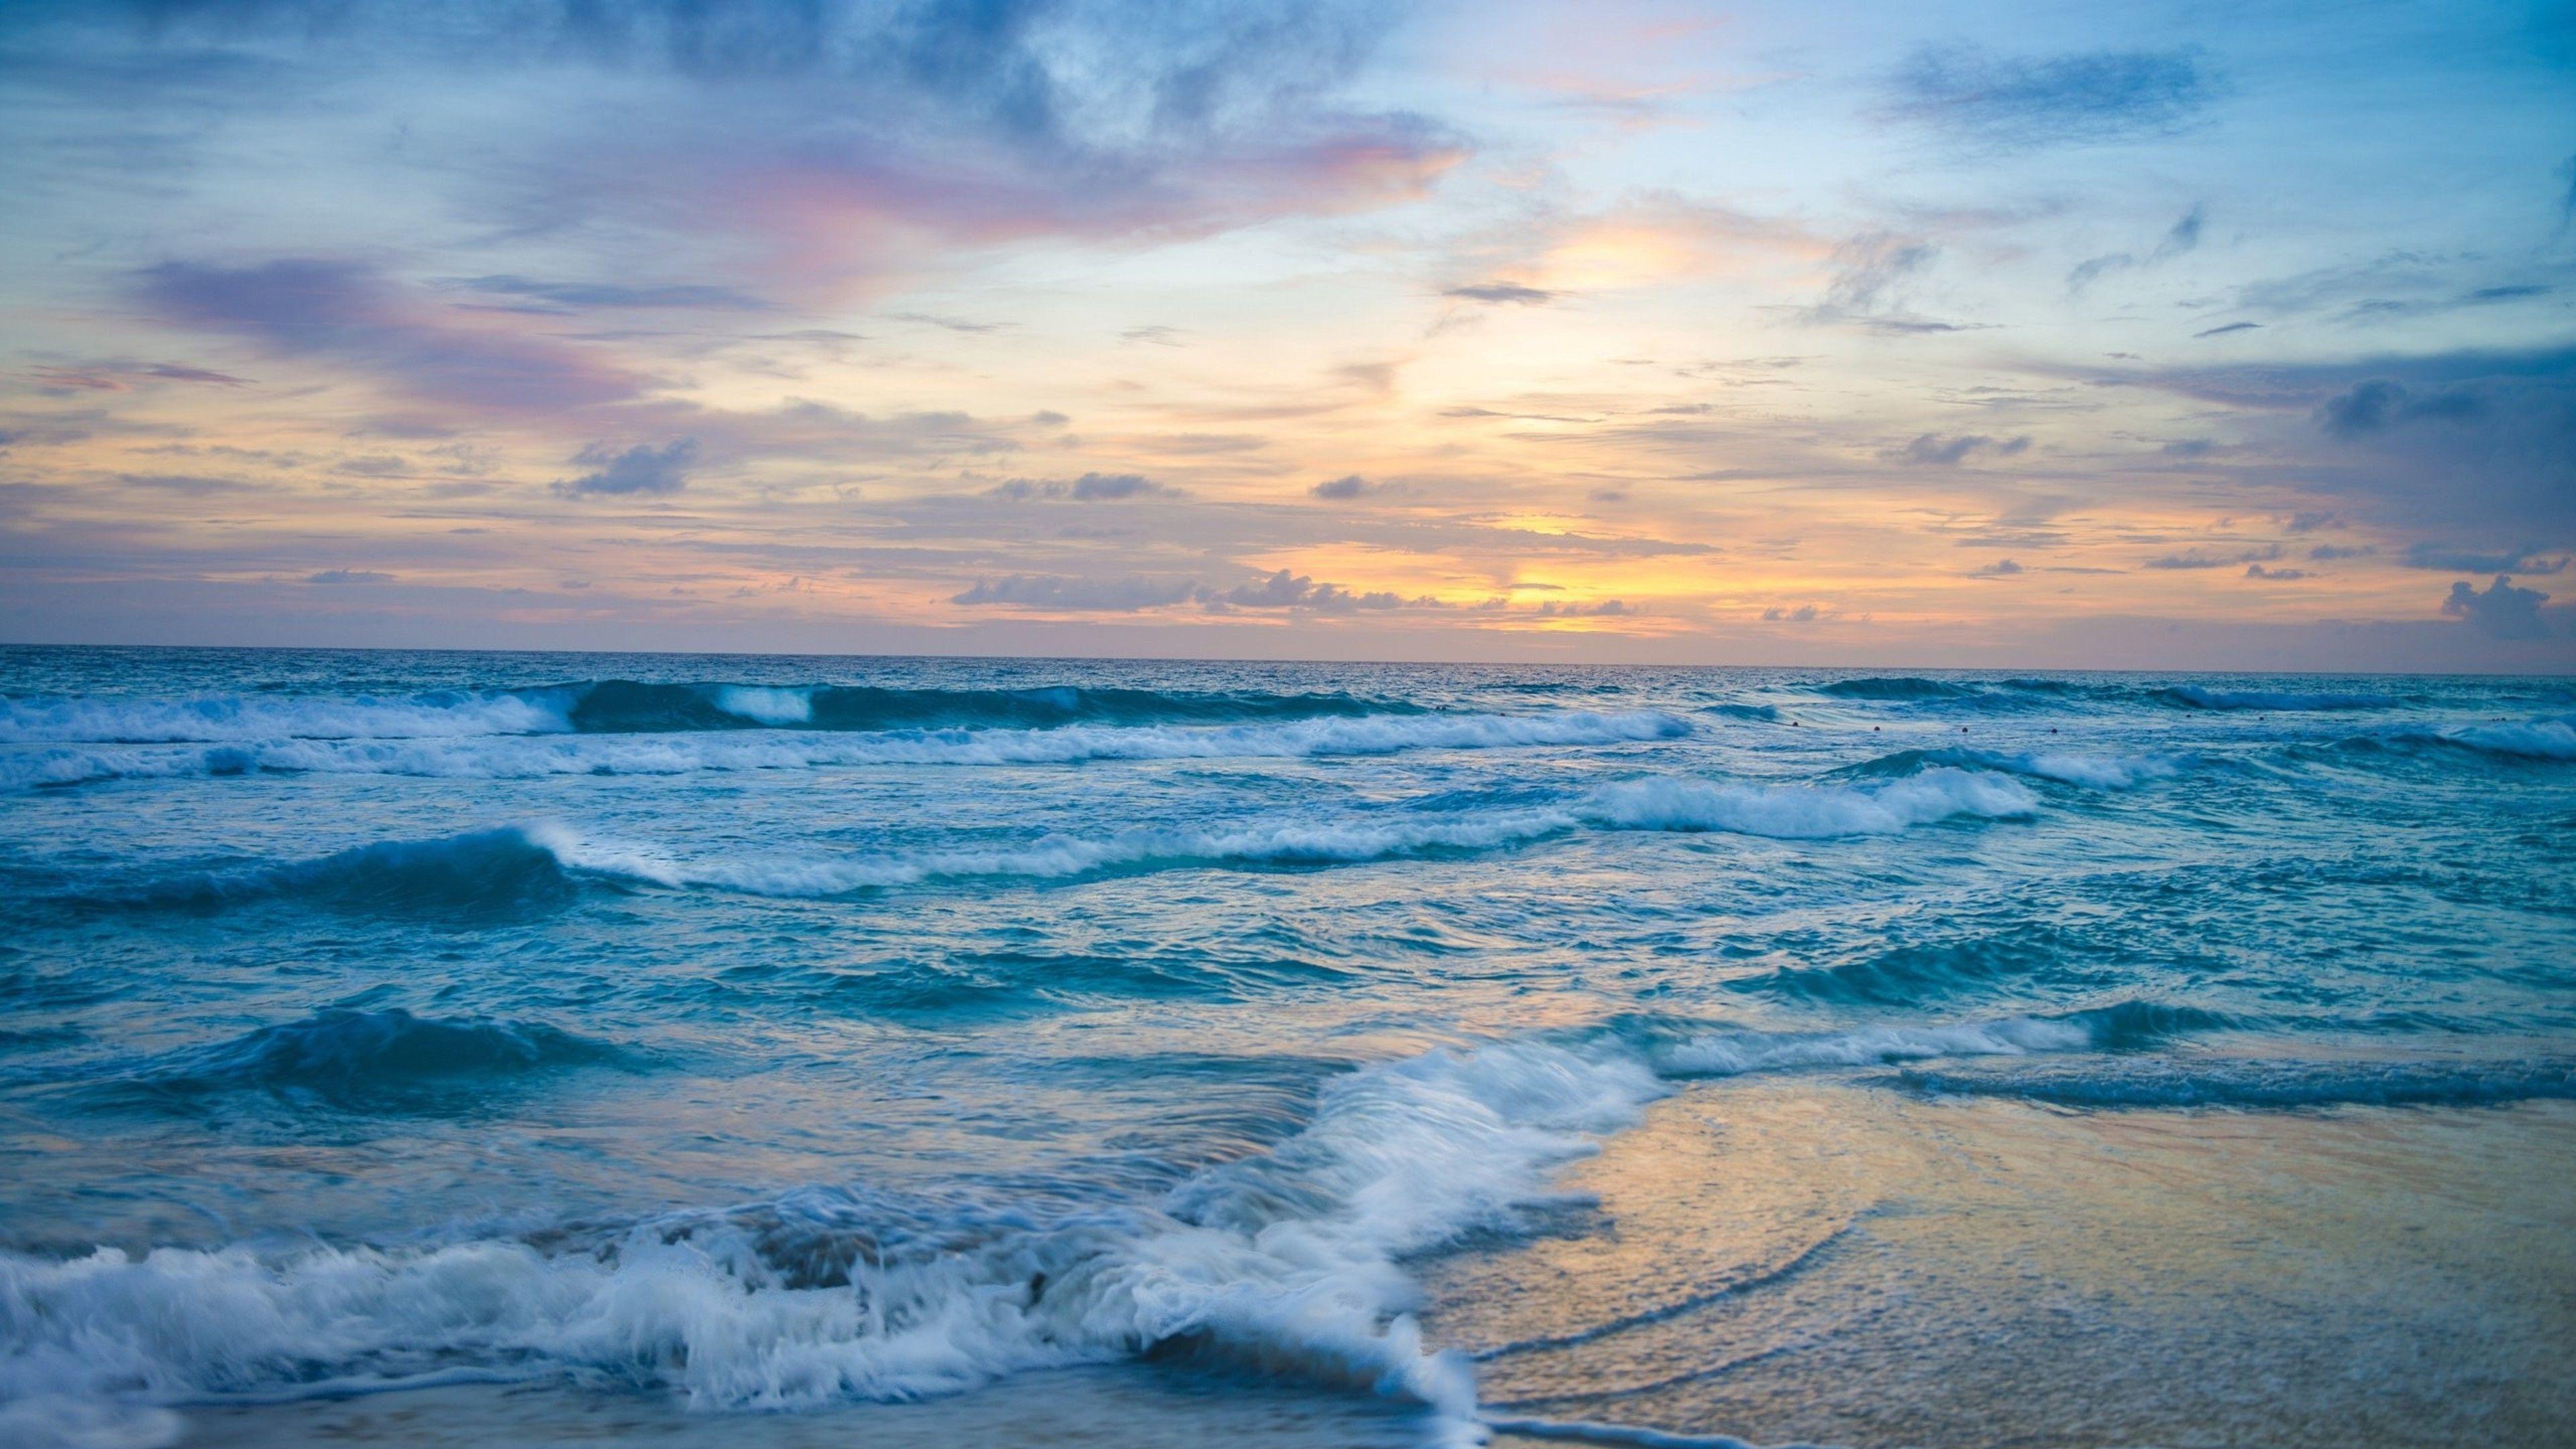 Ocean Laptop Wallpapers Top Free Ocean Laptop Backgrounds Wallpaperaccess Ocean Wallpaper Laptop Wallpaper Waves Wallpaper